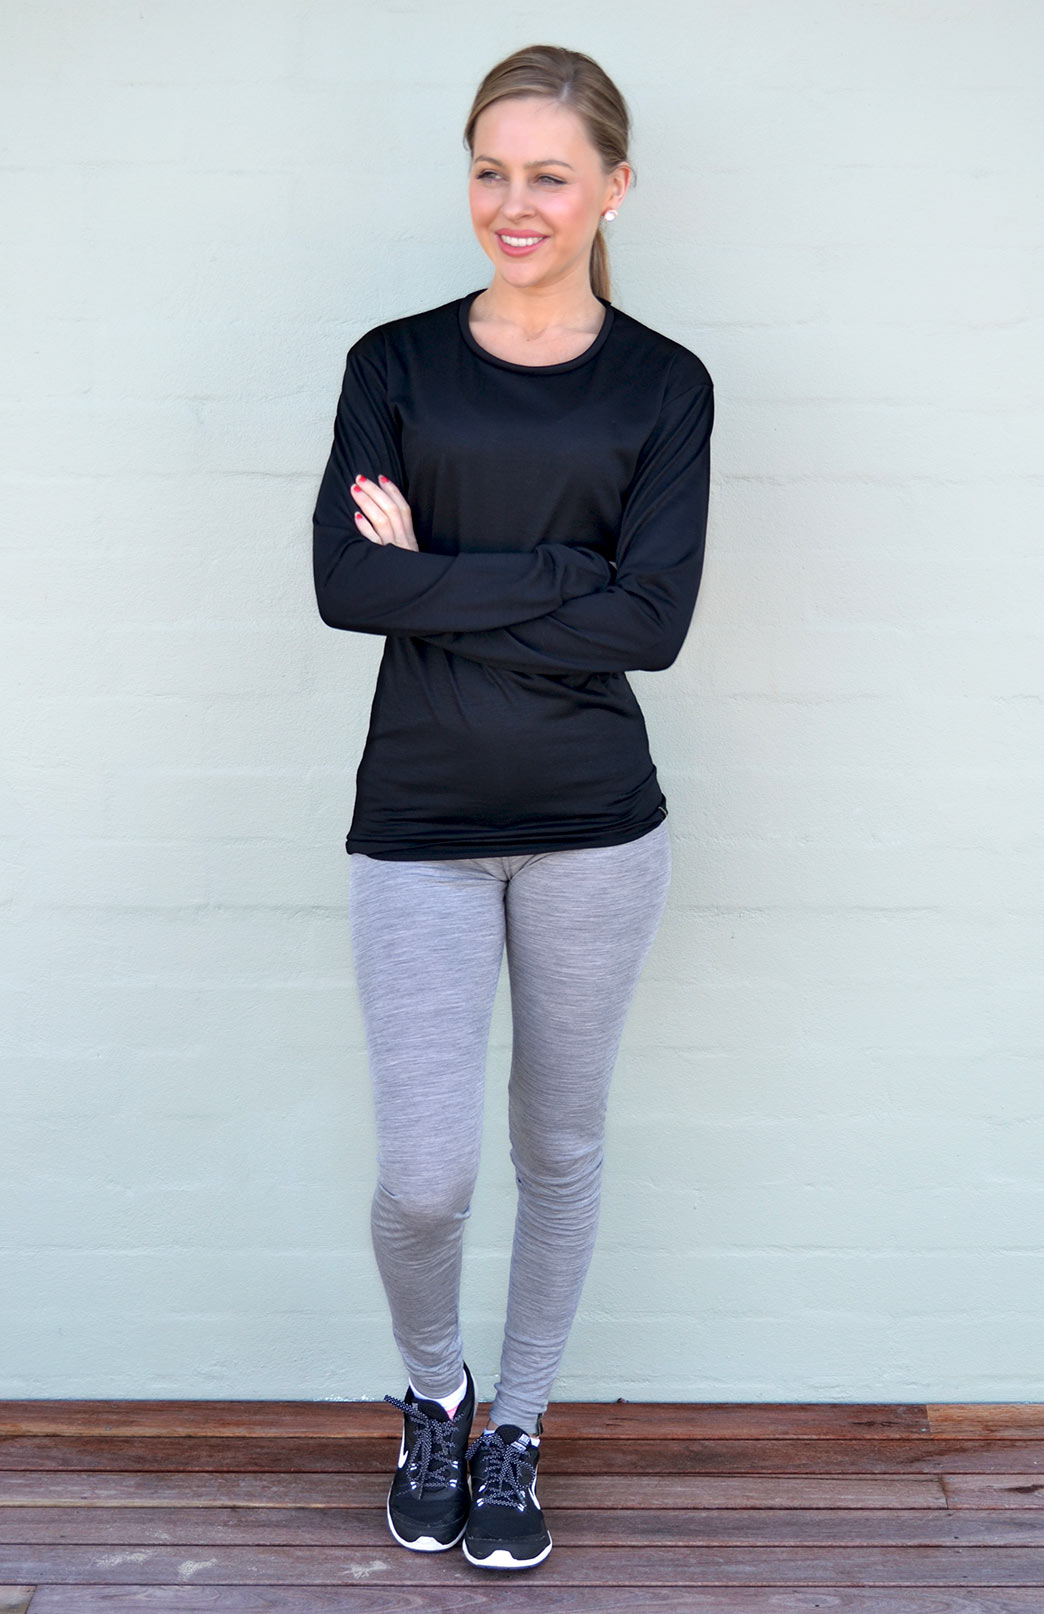 Long Sleeved Crew Neck Top - Heavyweight (360g) - Women's Black Heavyweight Long Sleeved Wool Crew Neck Top Pullover - Smitten Merino Tasmania Australia